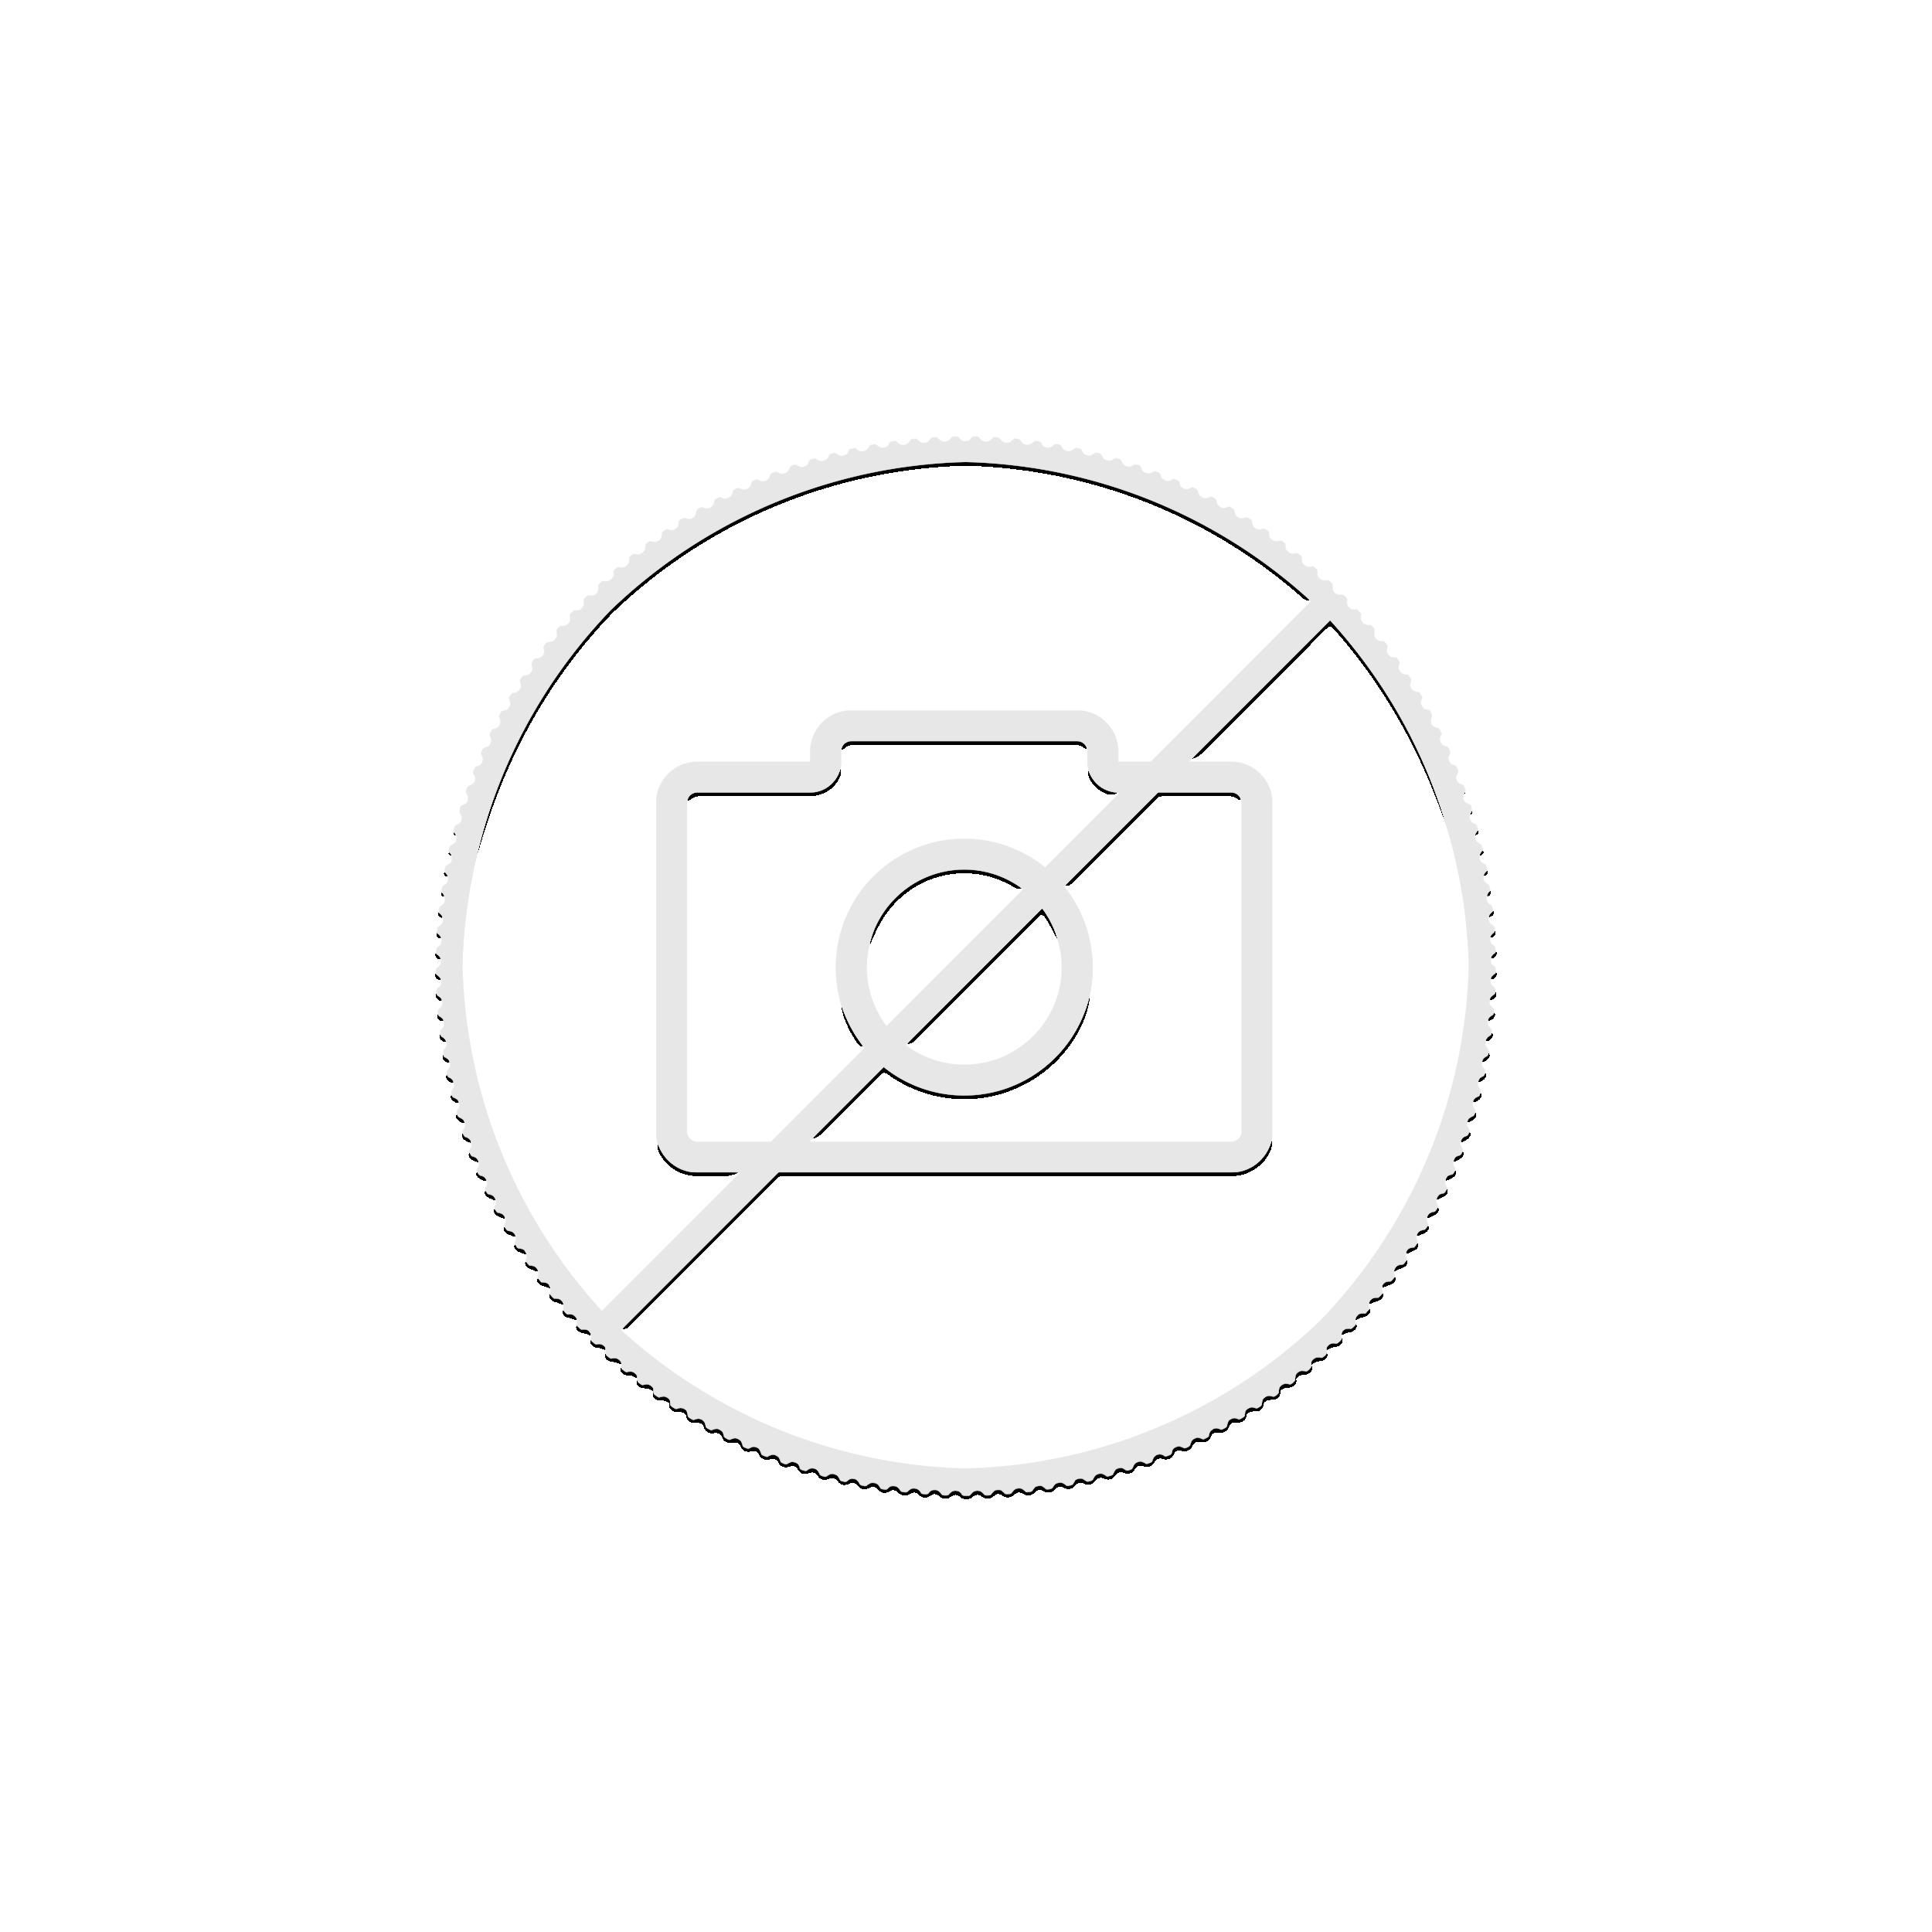 1/10 Troy ounce golden Krugerrand coin 2021 - back